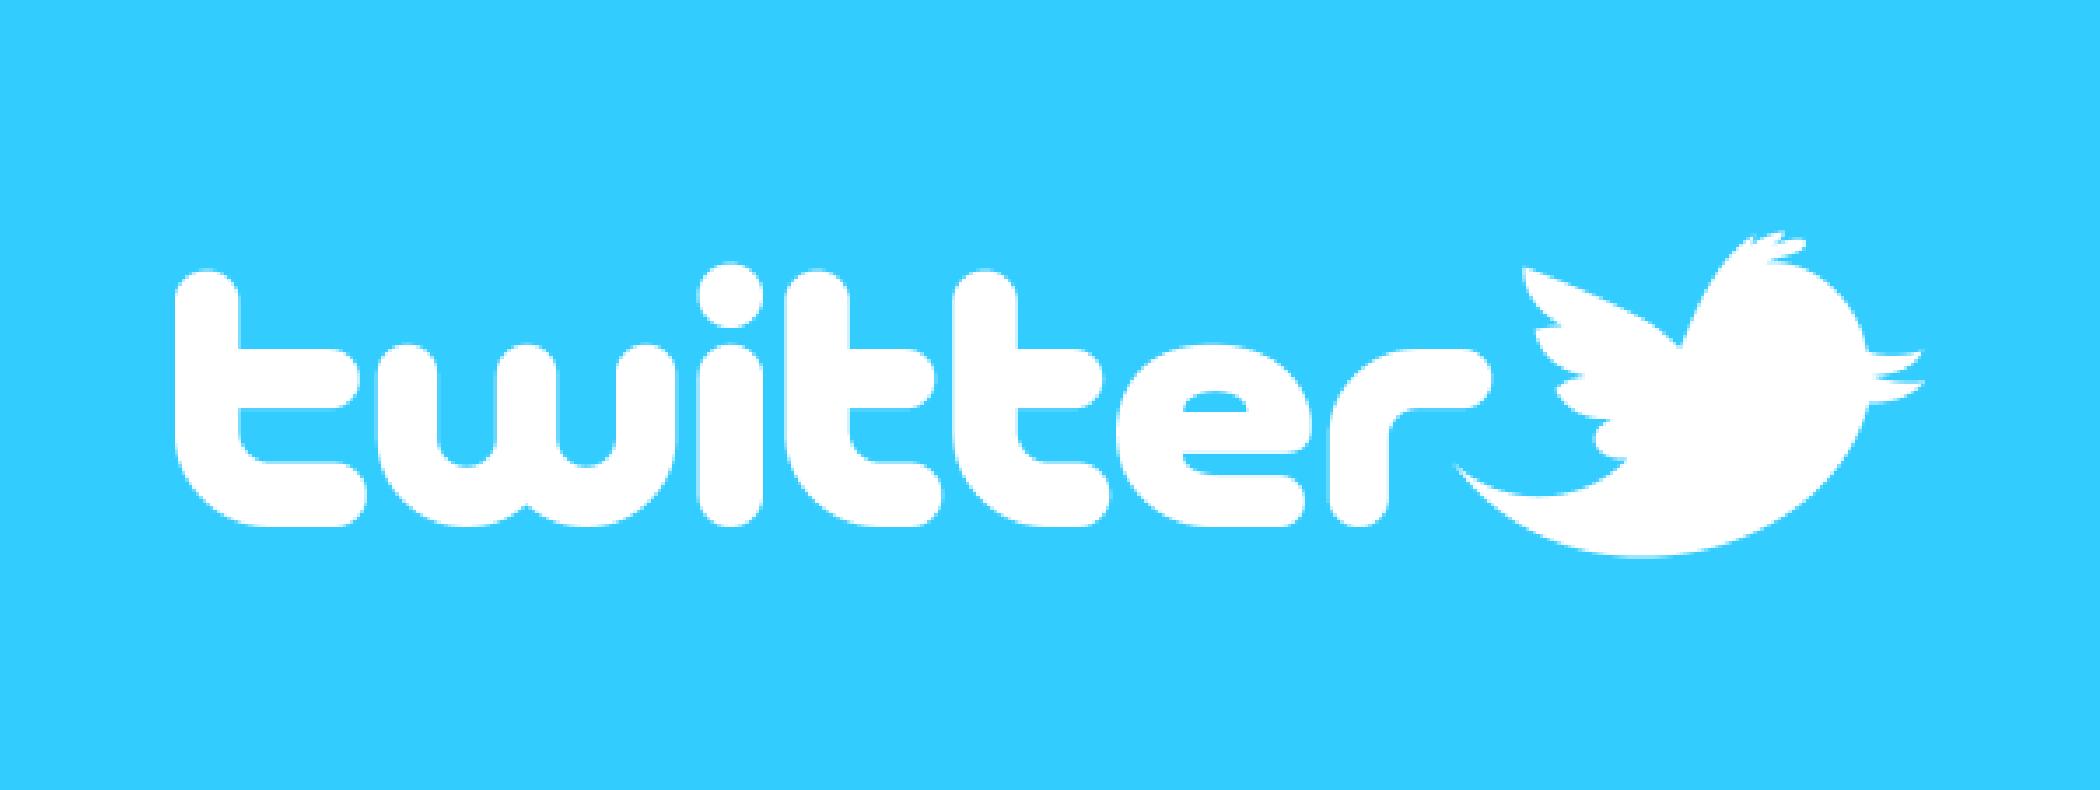 twitter-logo.png (2100×790)